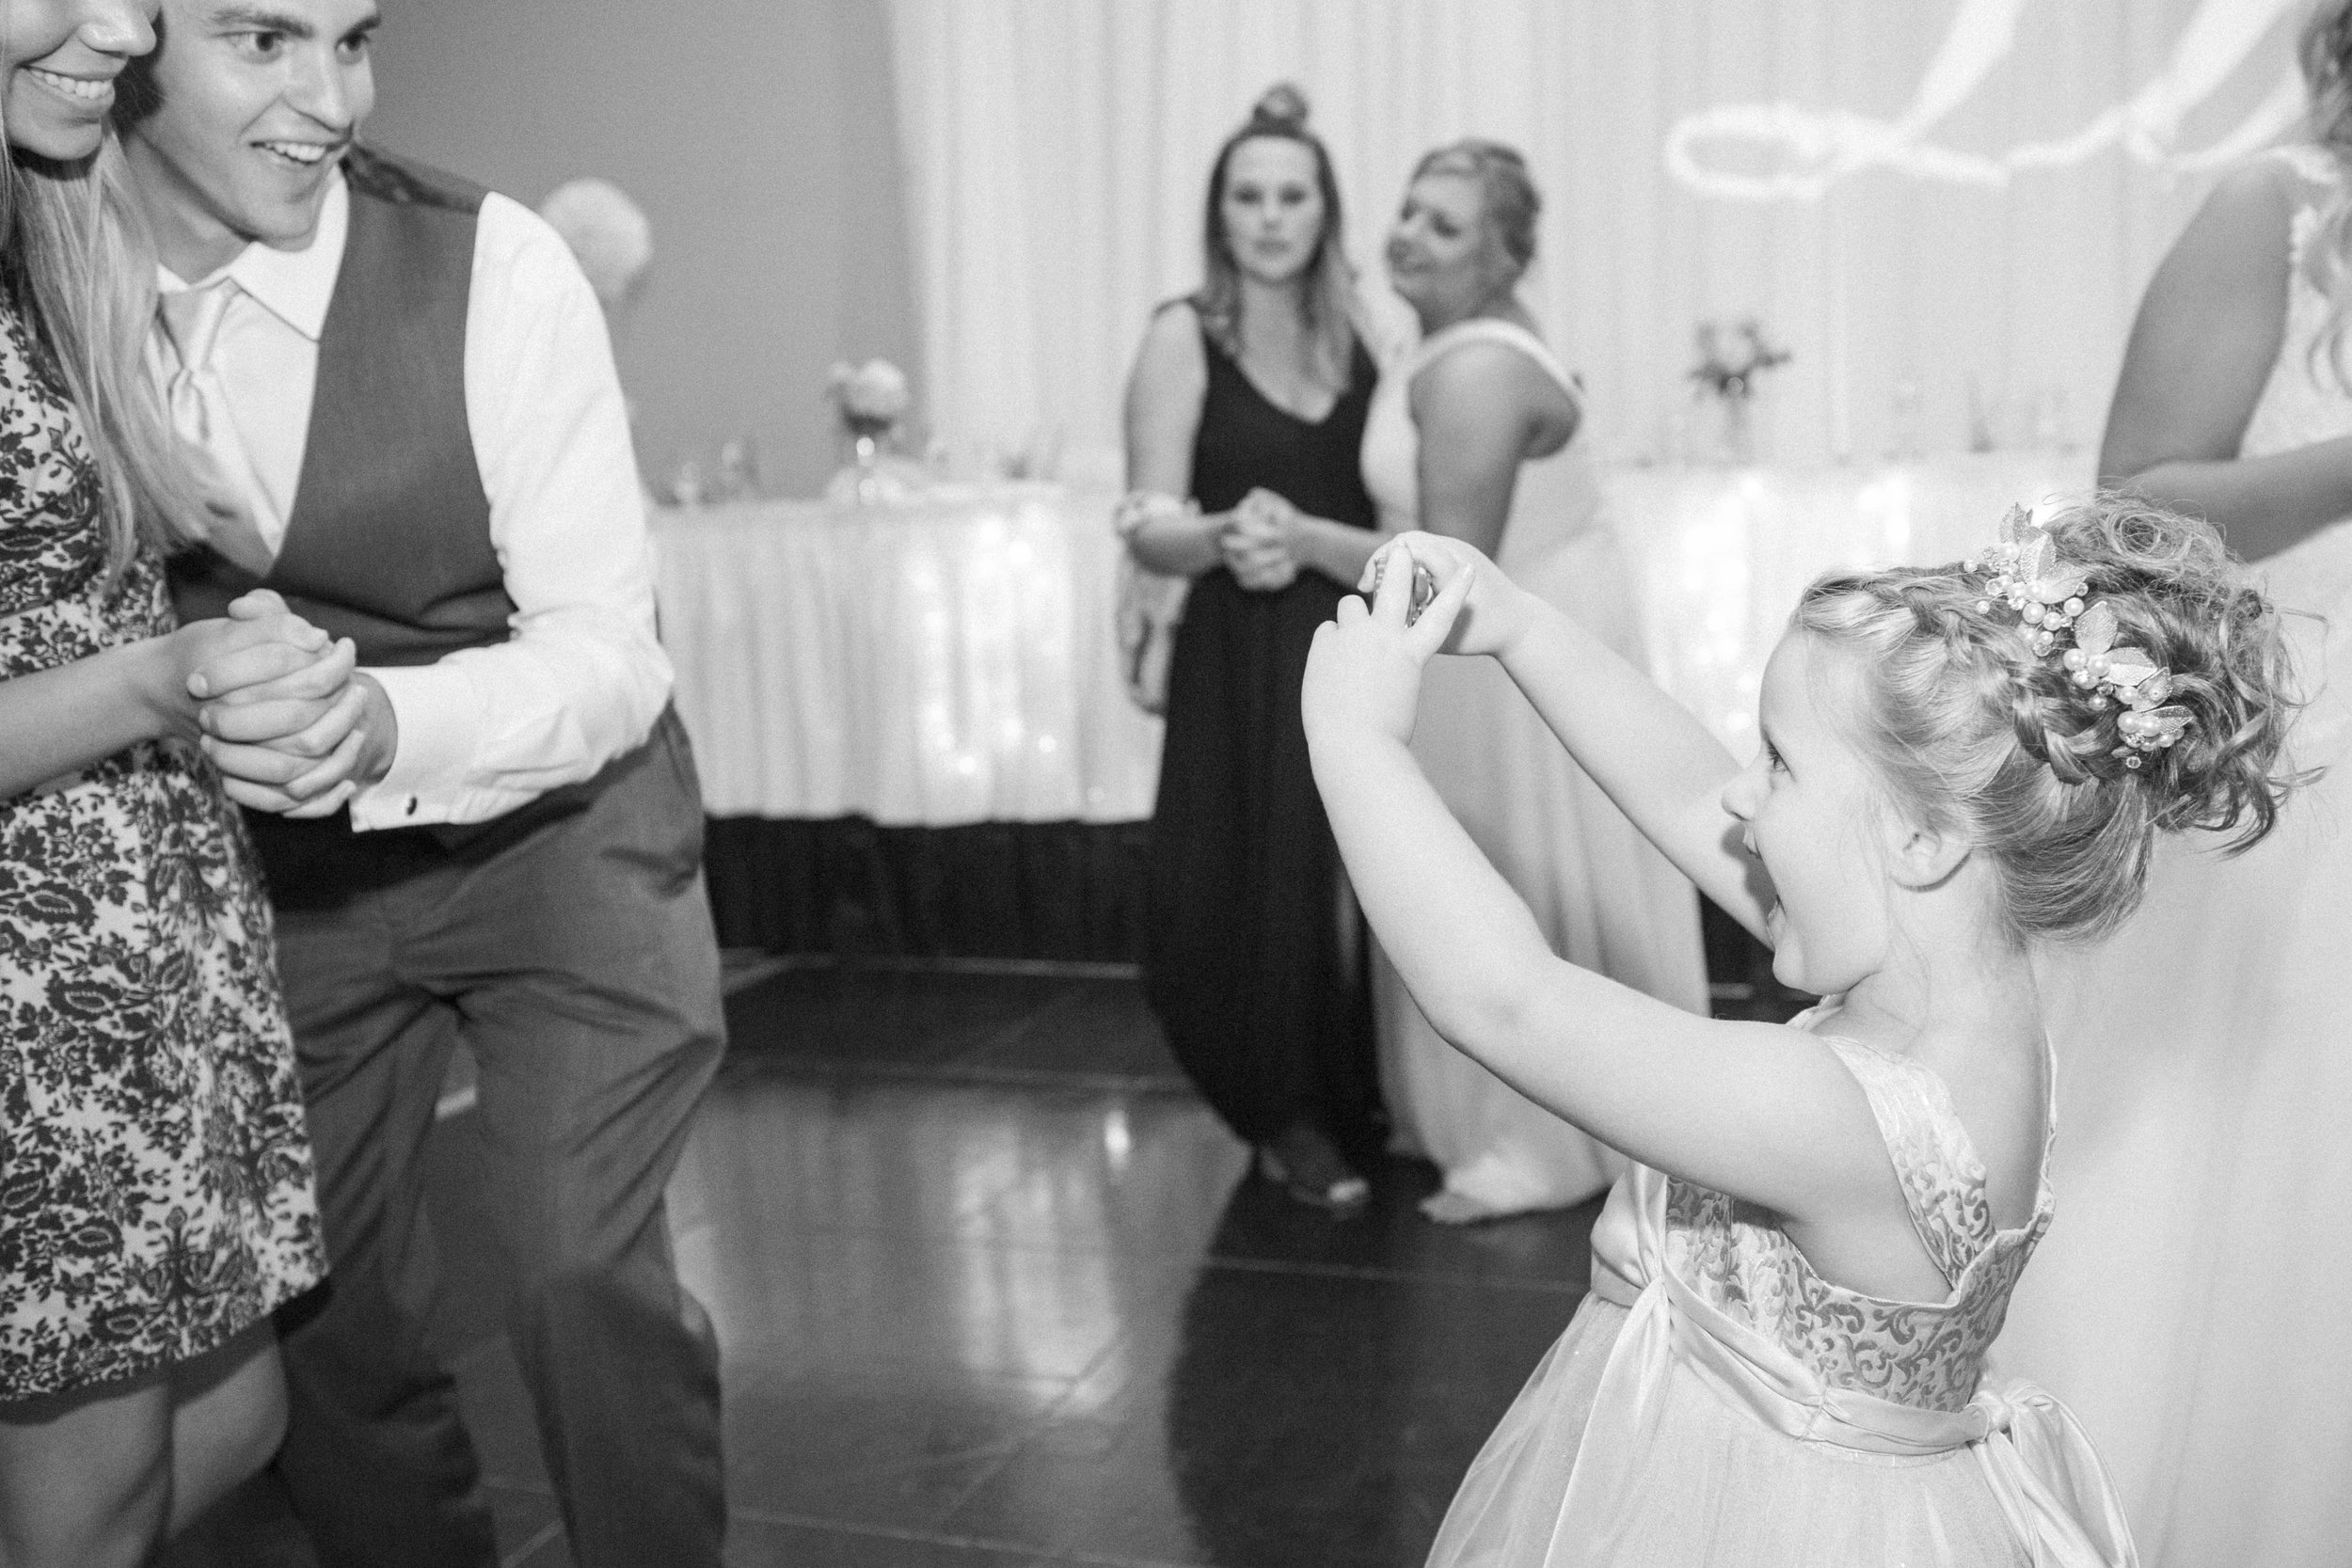 shotbychelsea_wedding_blog-52.jpg